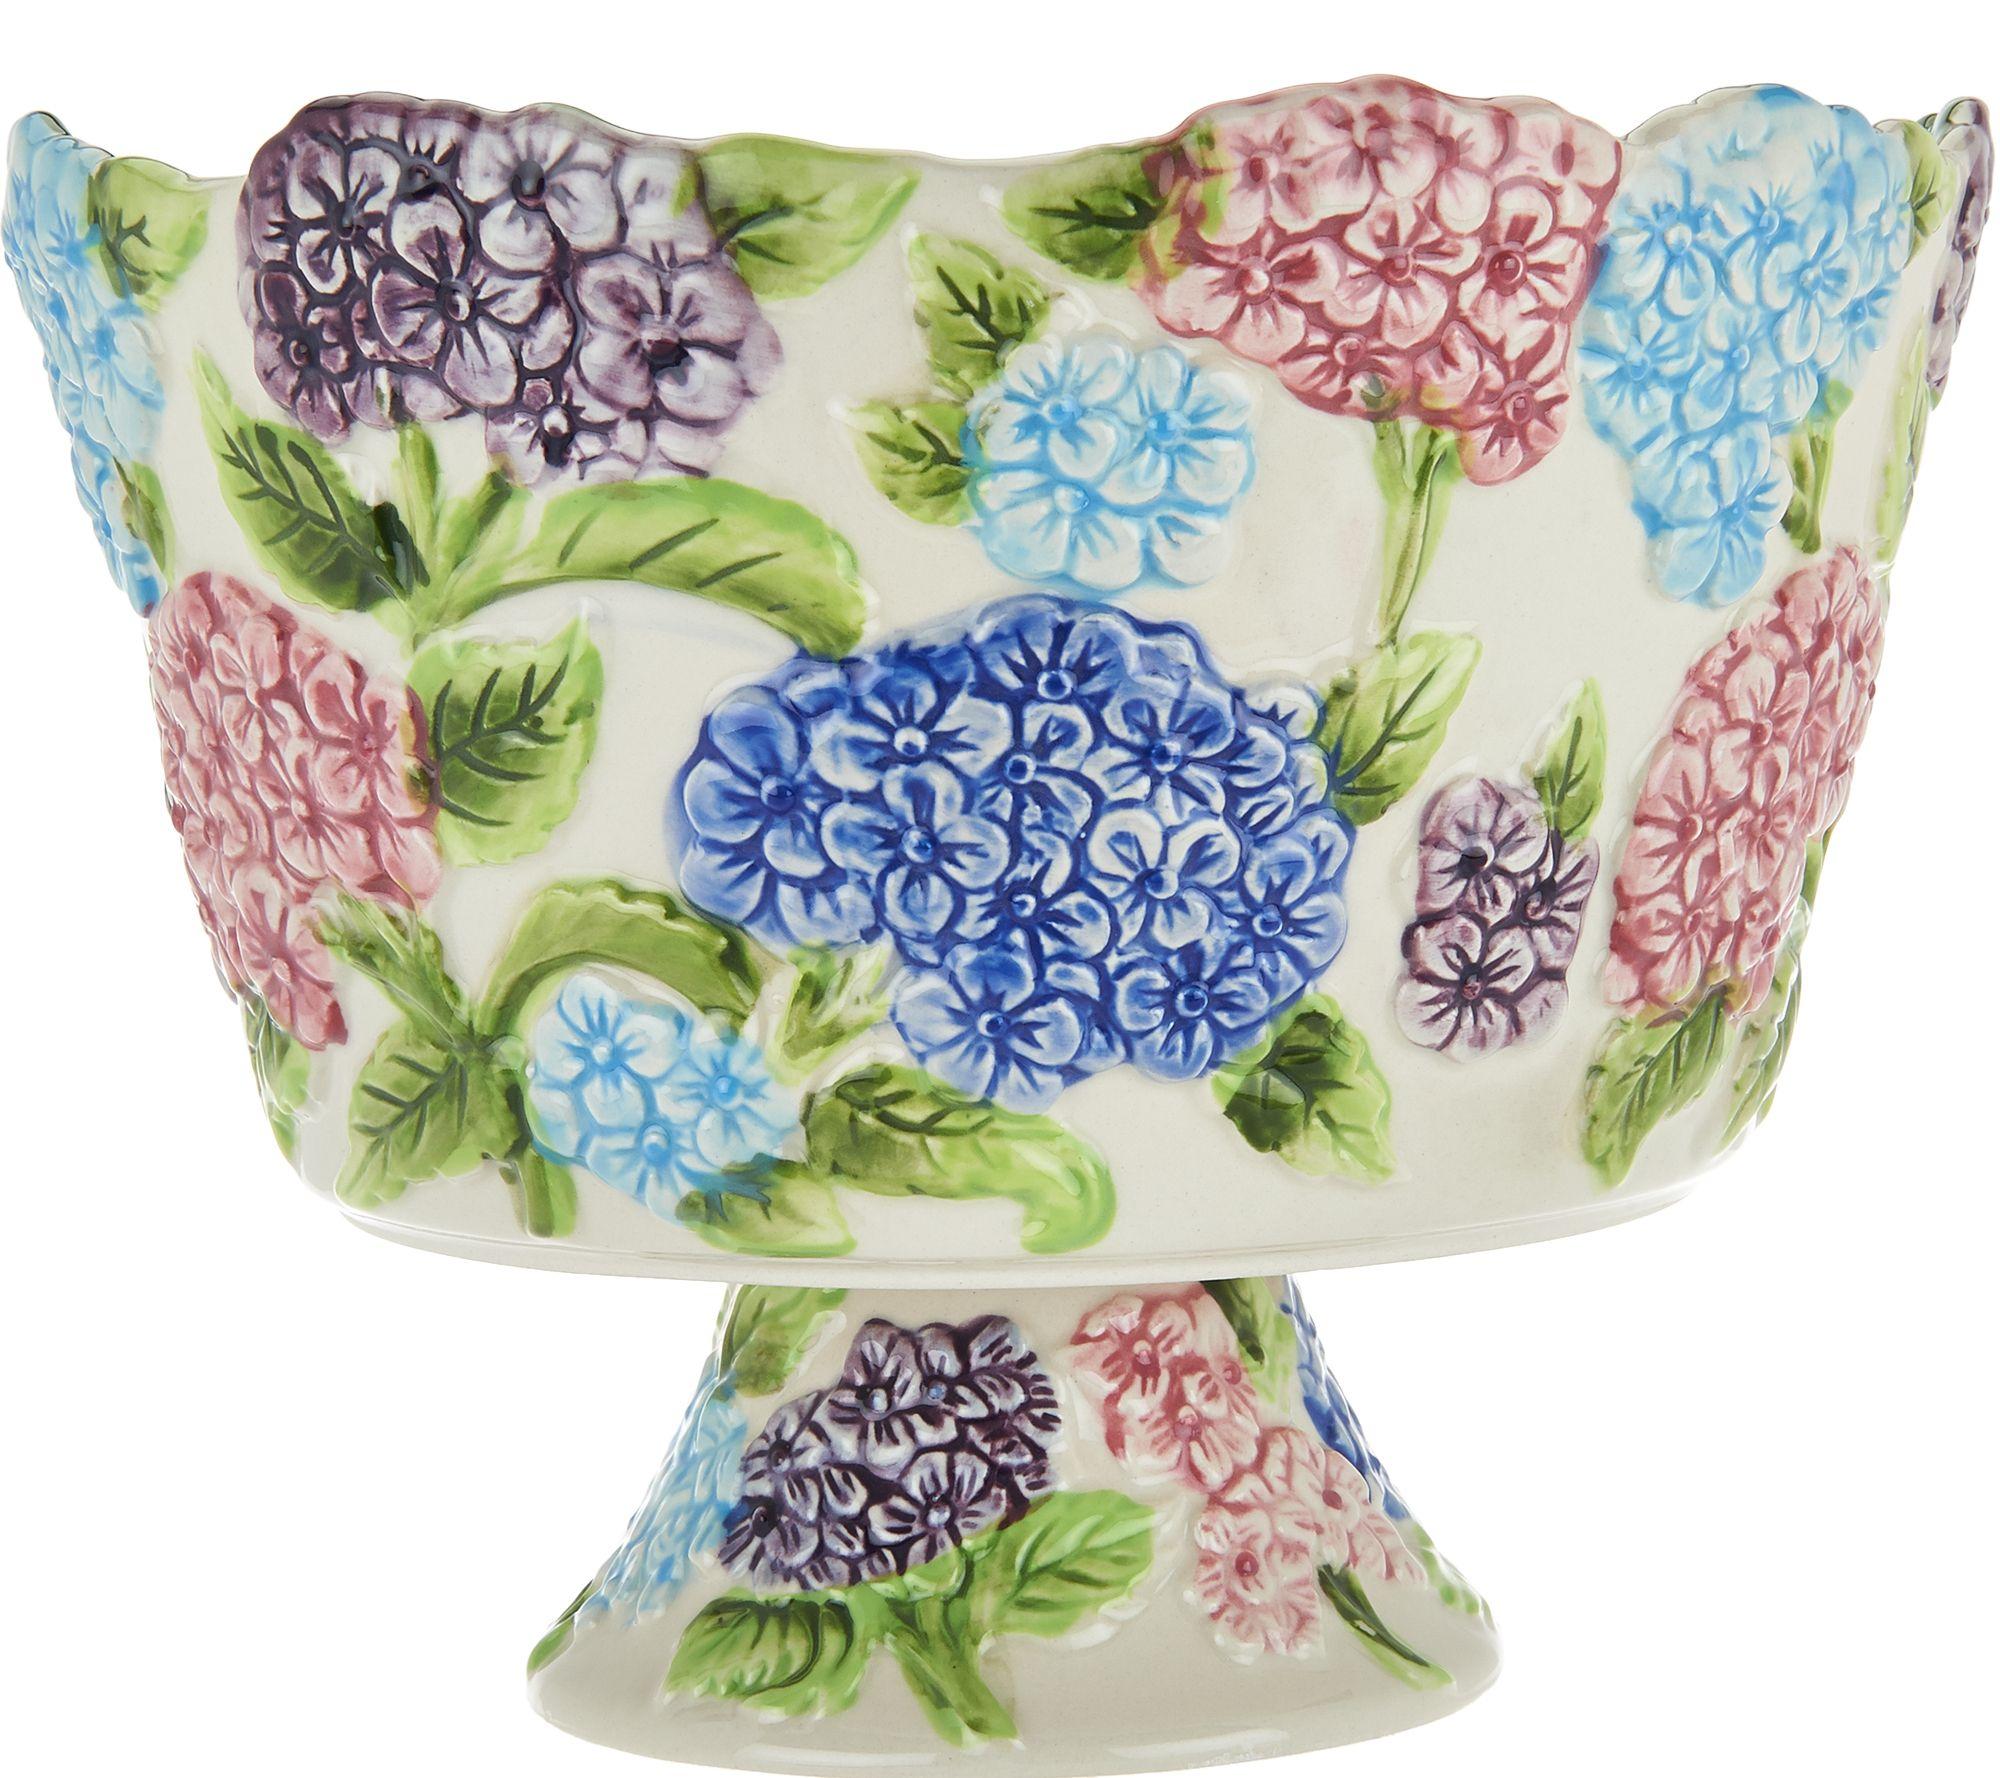 sc 1 st  QVC.com & Temp-tations Figural Floral 3 qt. Trifle Bowl - Page 1 u2014 QVC.com